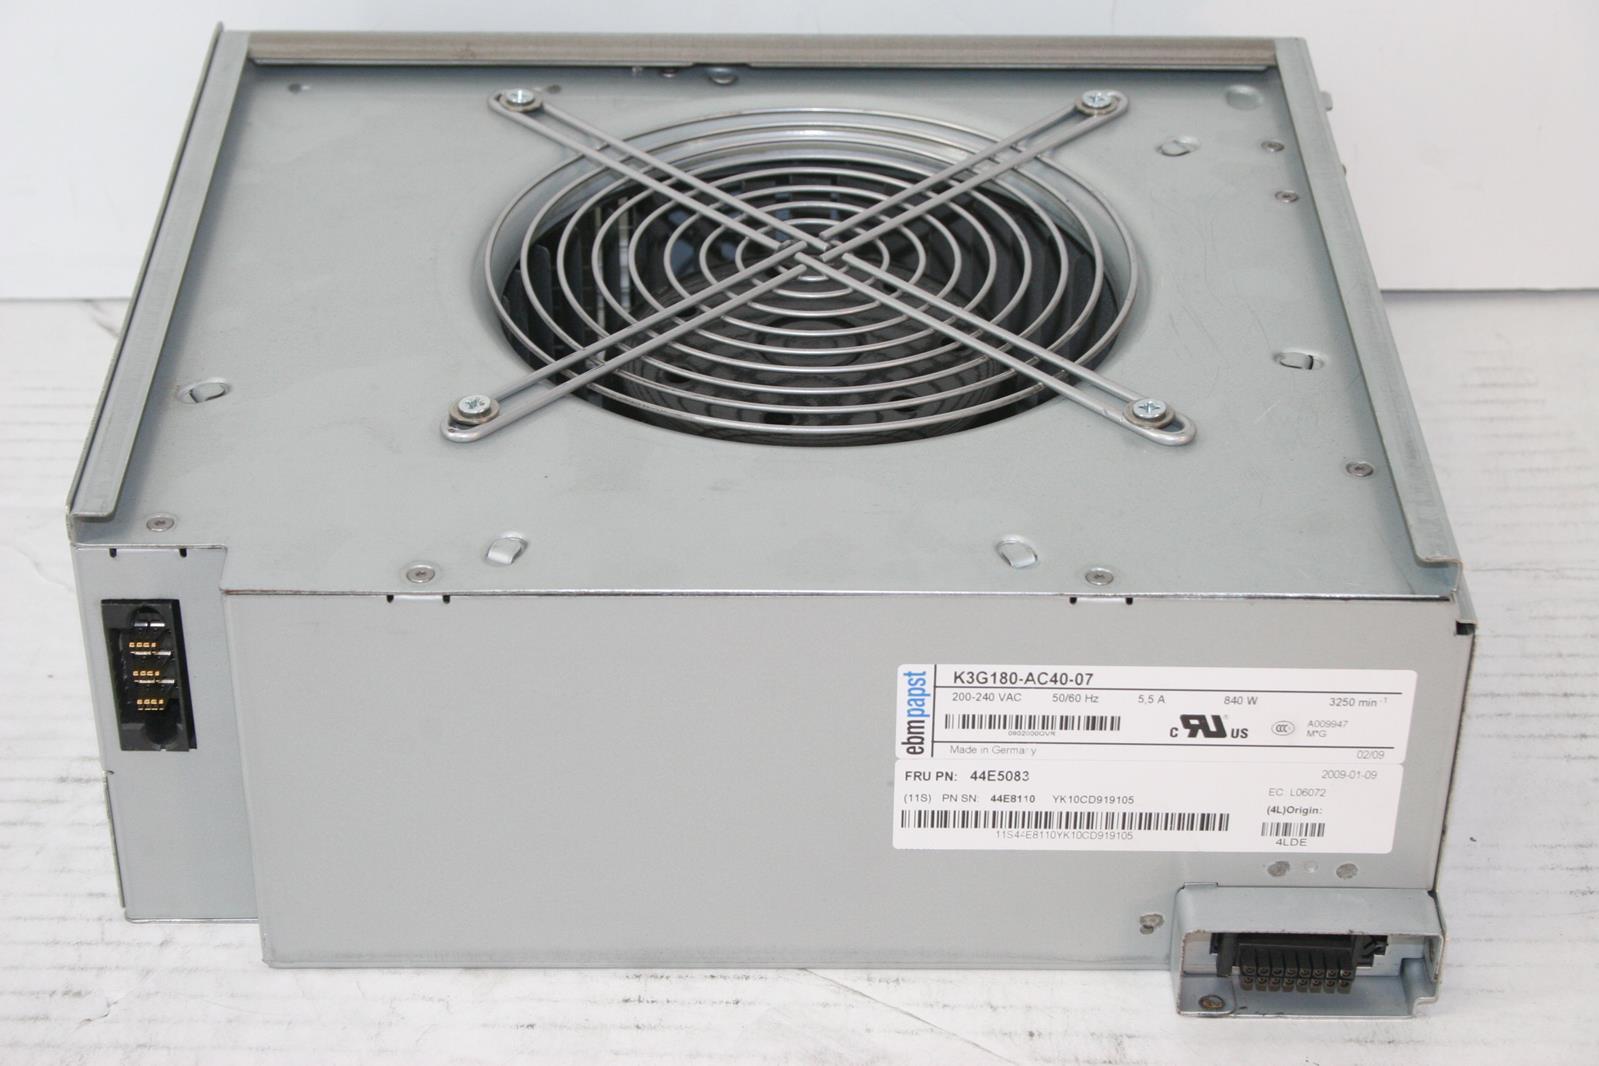 IBM Fan Blower Module BladeCenter H Chassis 44E5083 K3G180-AC40-07